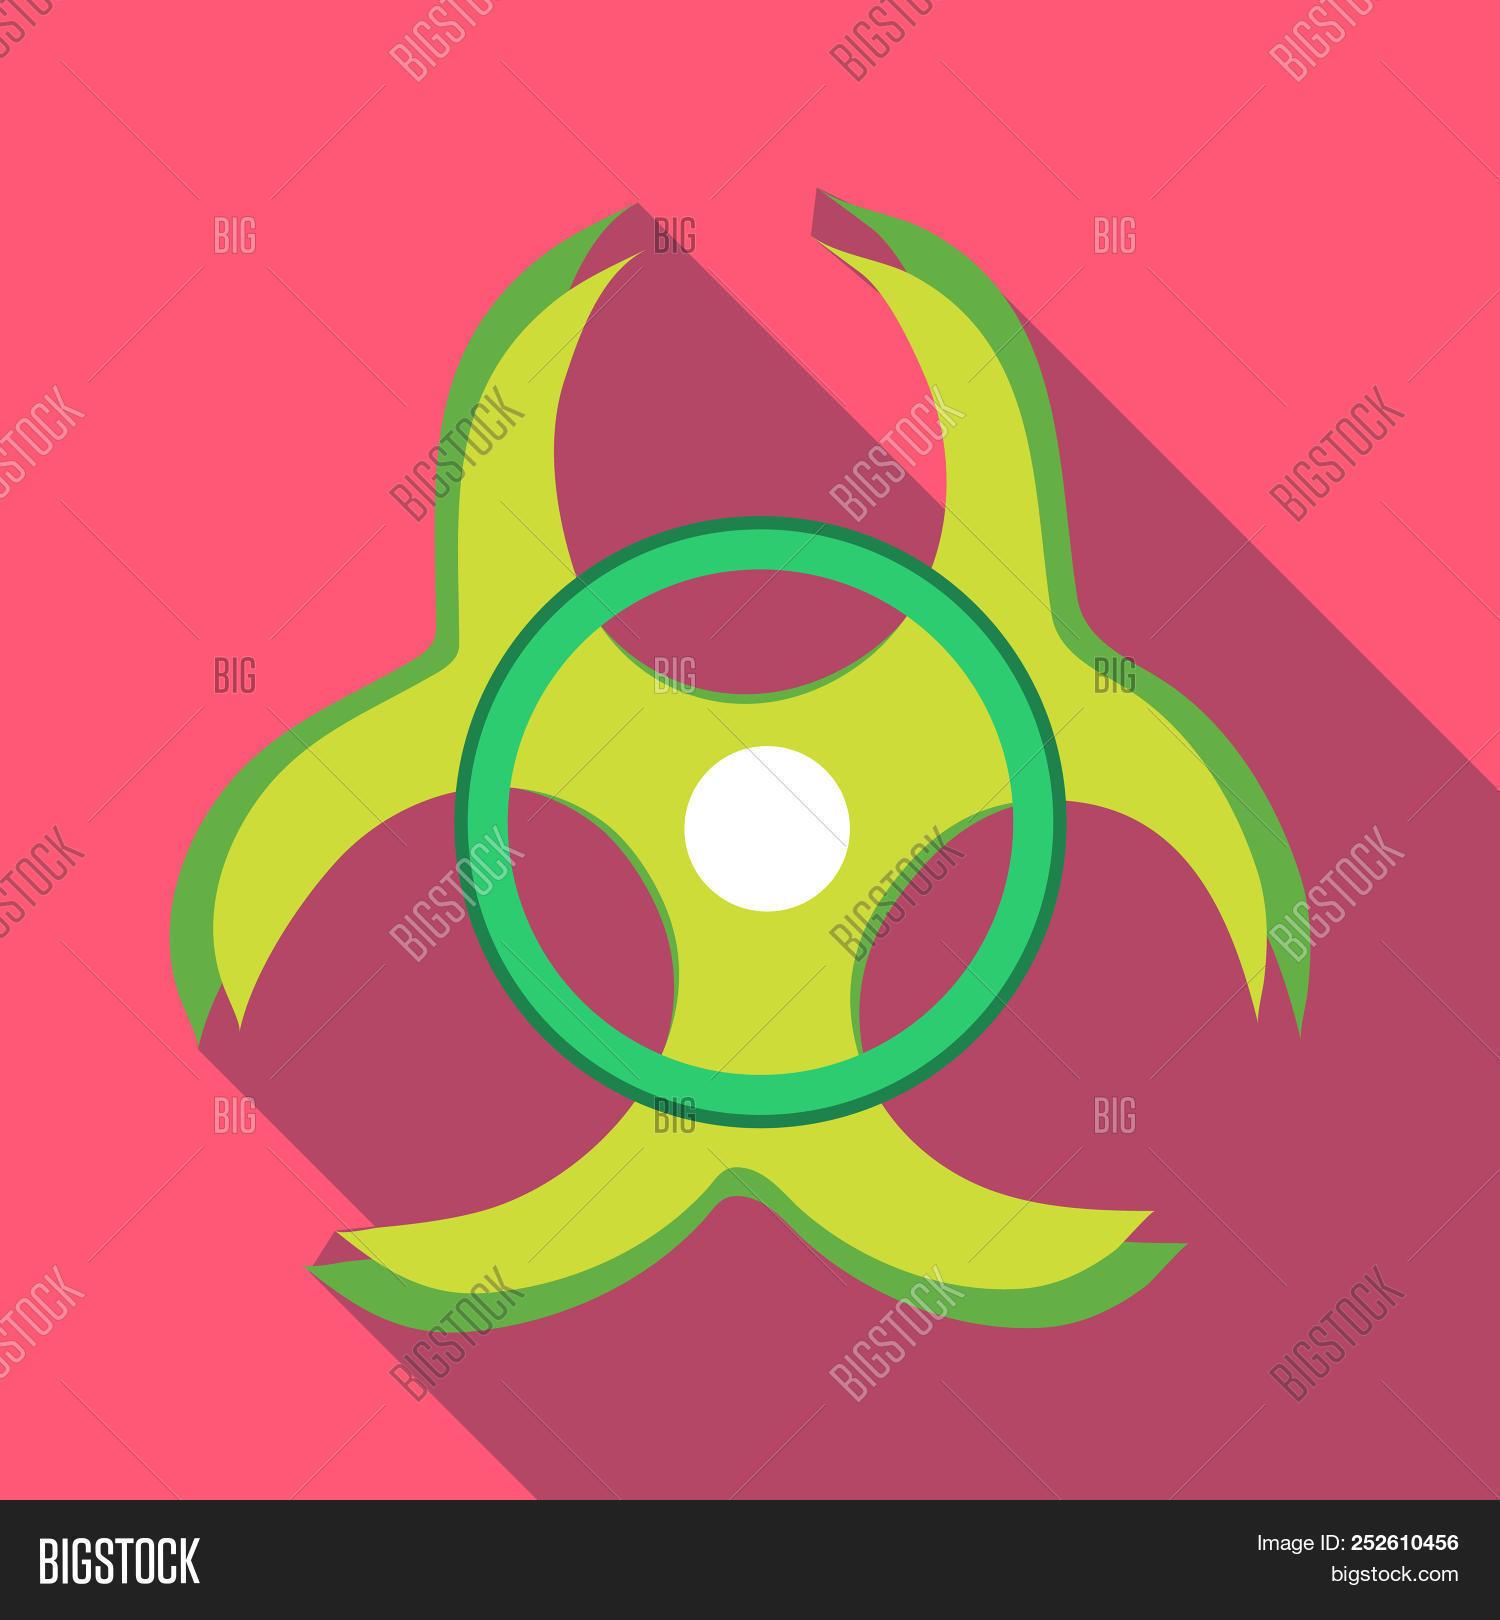 Biohazard Symbol Icon Image Photo Free Trial Bigstock